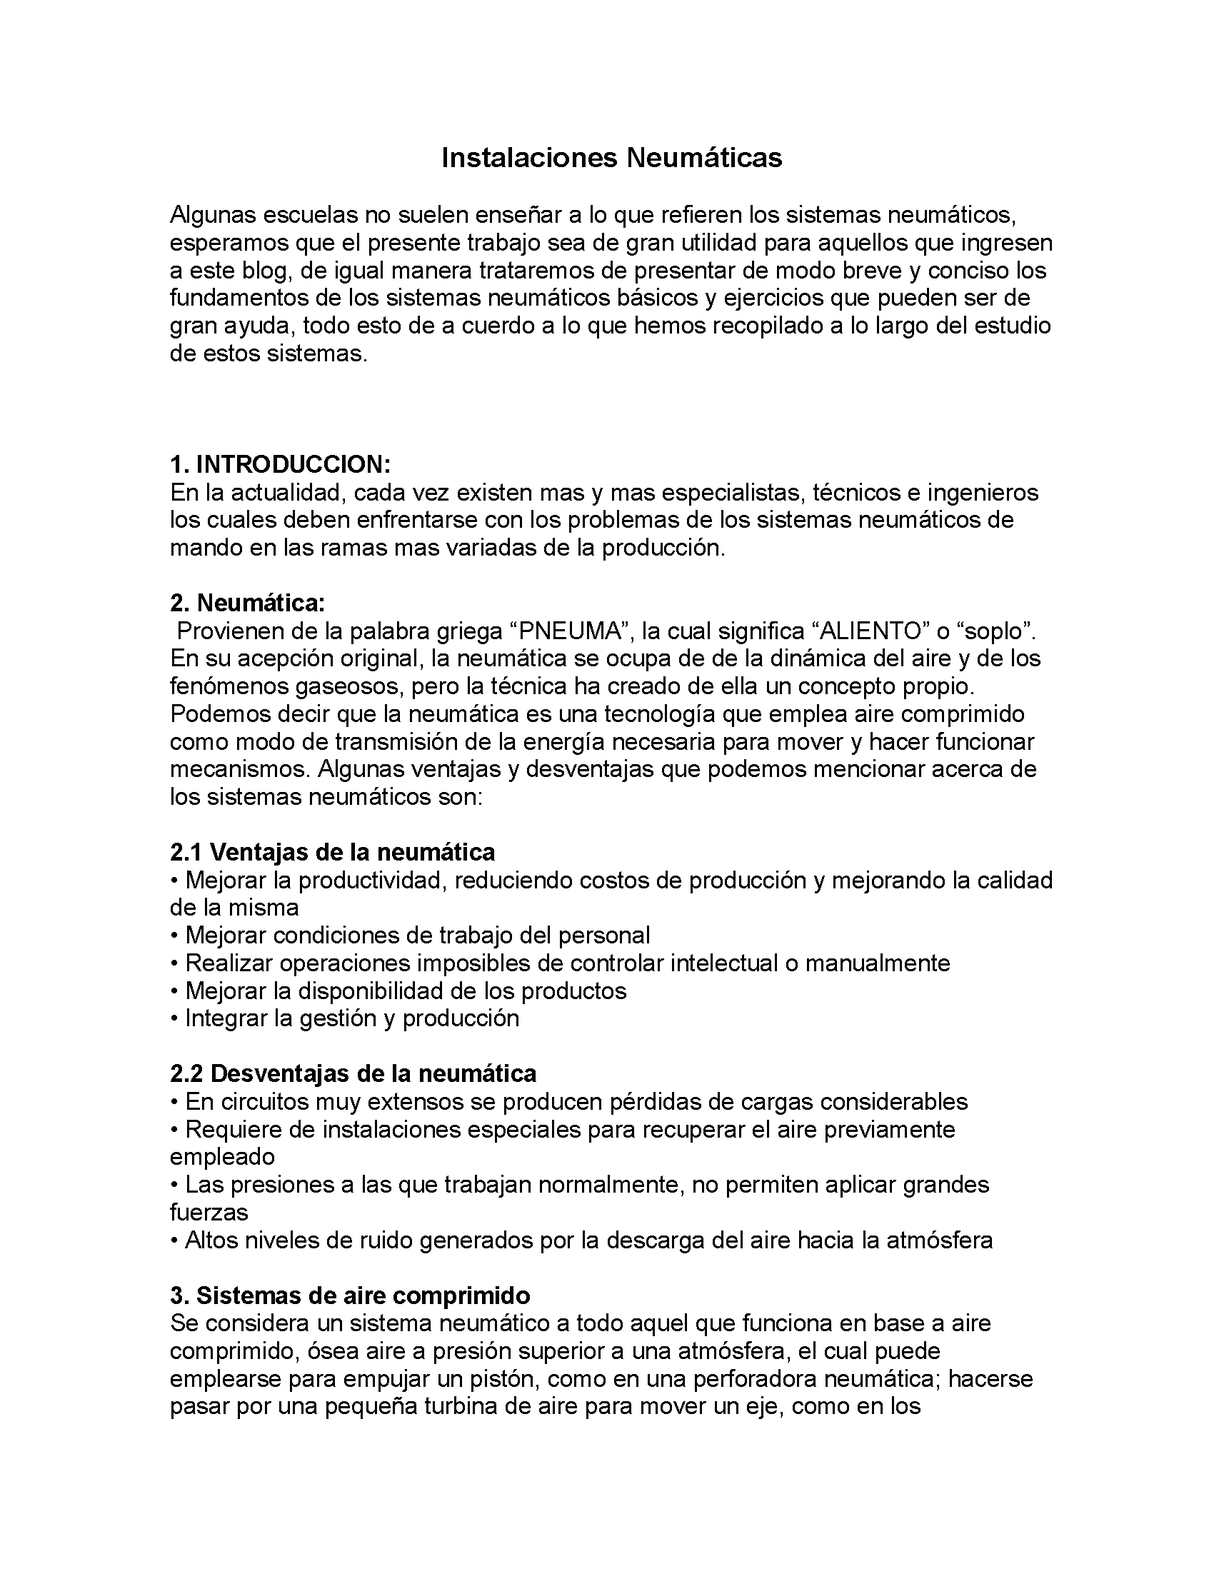 Circuito Neumatico Basico : Calaméo instalaciones neumaticas